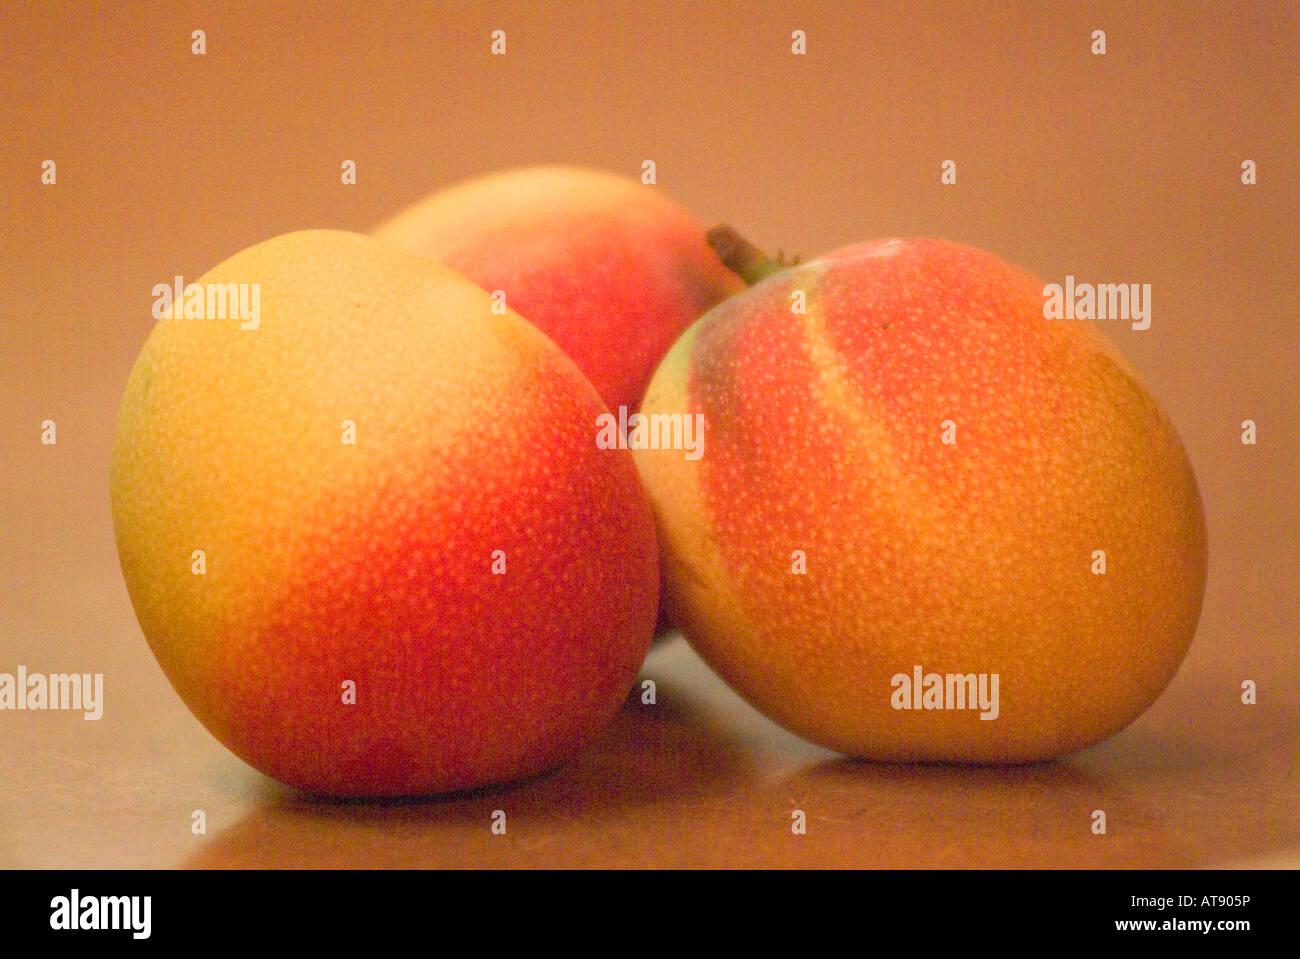 Tre i manghi maturi seduto sul bancone Foto Stock